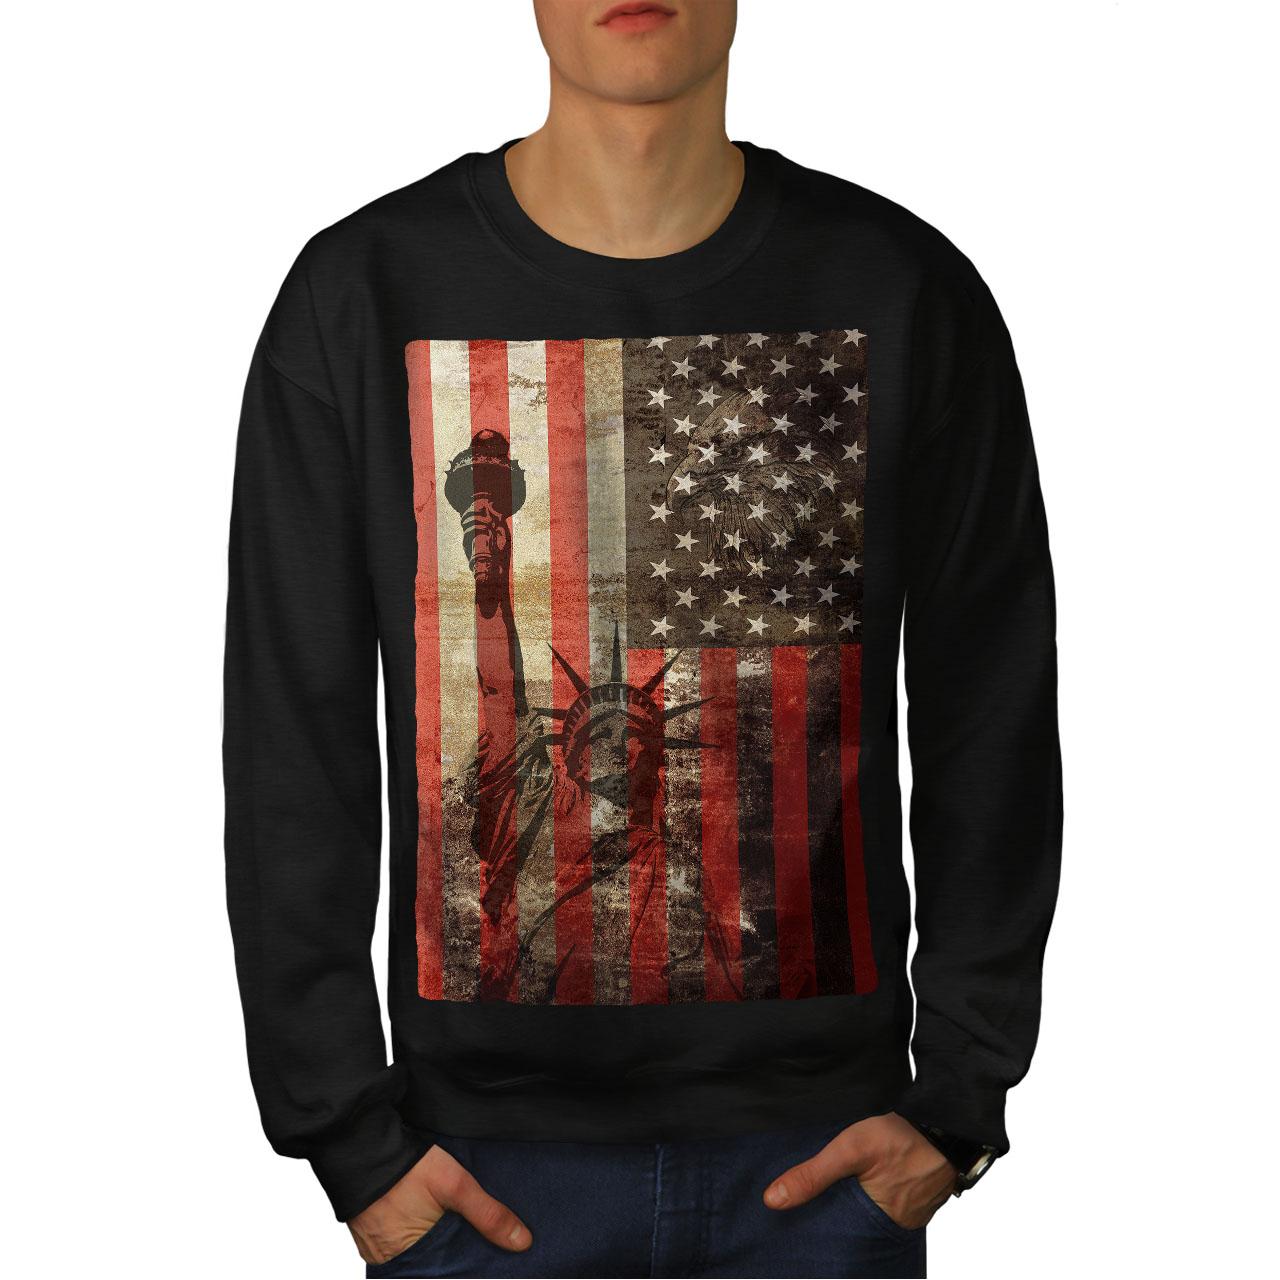 Wellcoda New York Flag Freedom Mens Contrast Hoodie Tourism Casual Jumper